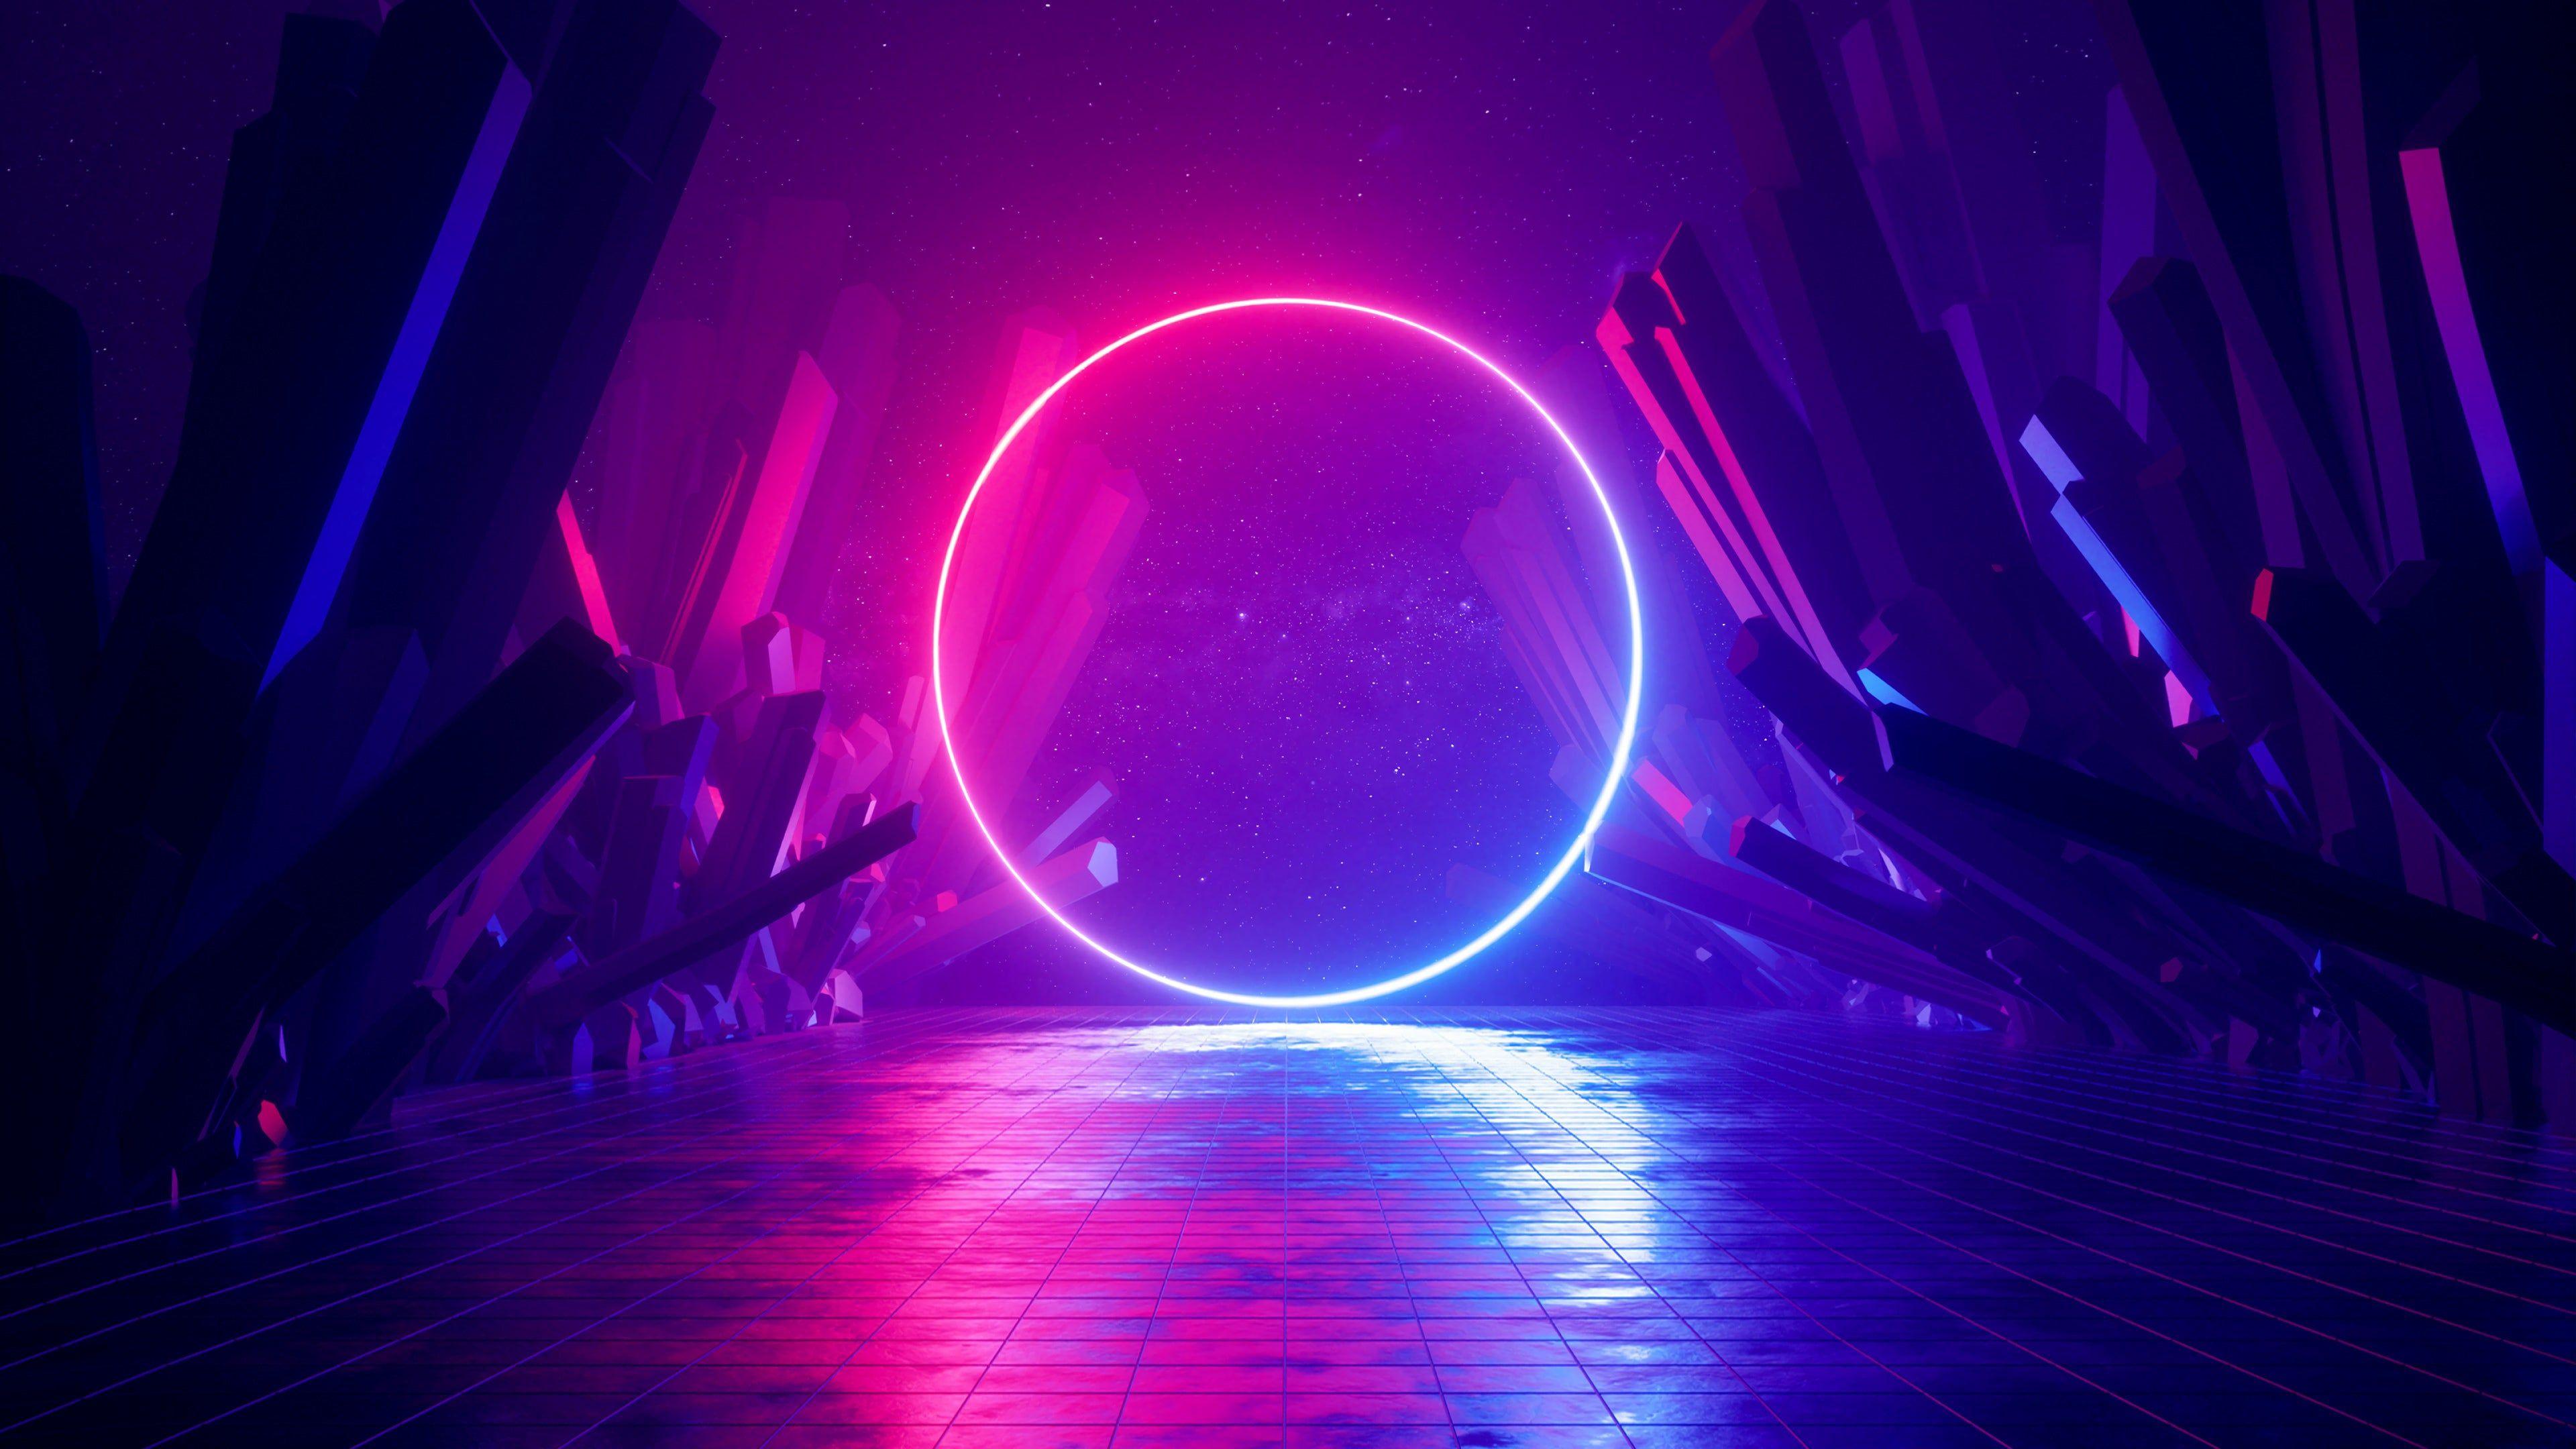 Ultraviolet 4k Wallpaper 3840 X 2160 Neon Wallpaper Cool Wallpapers 4k Graphic Wallpaper